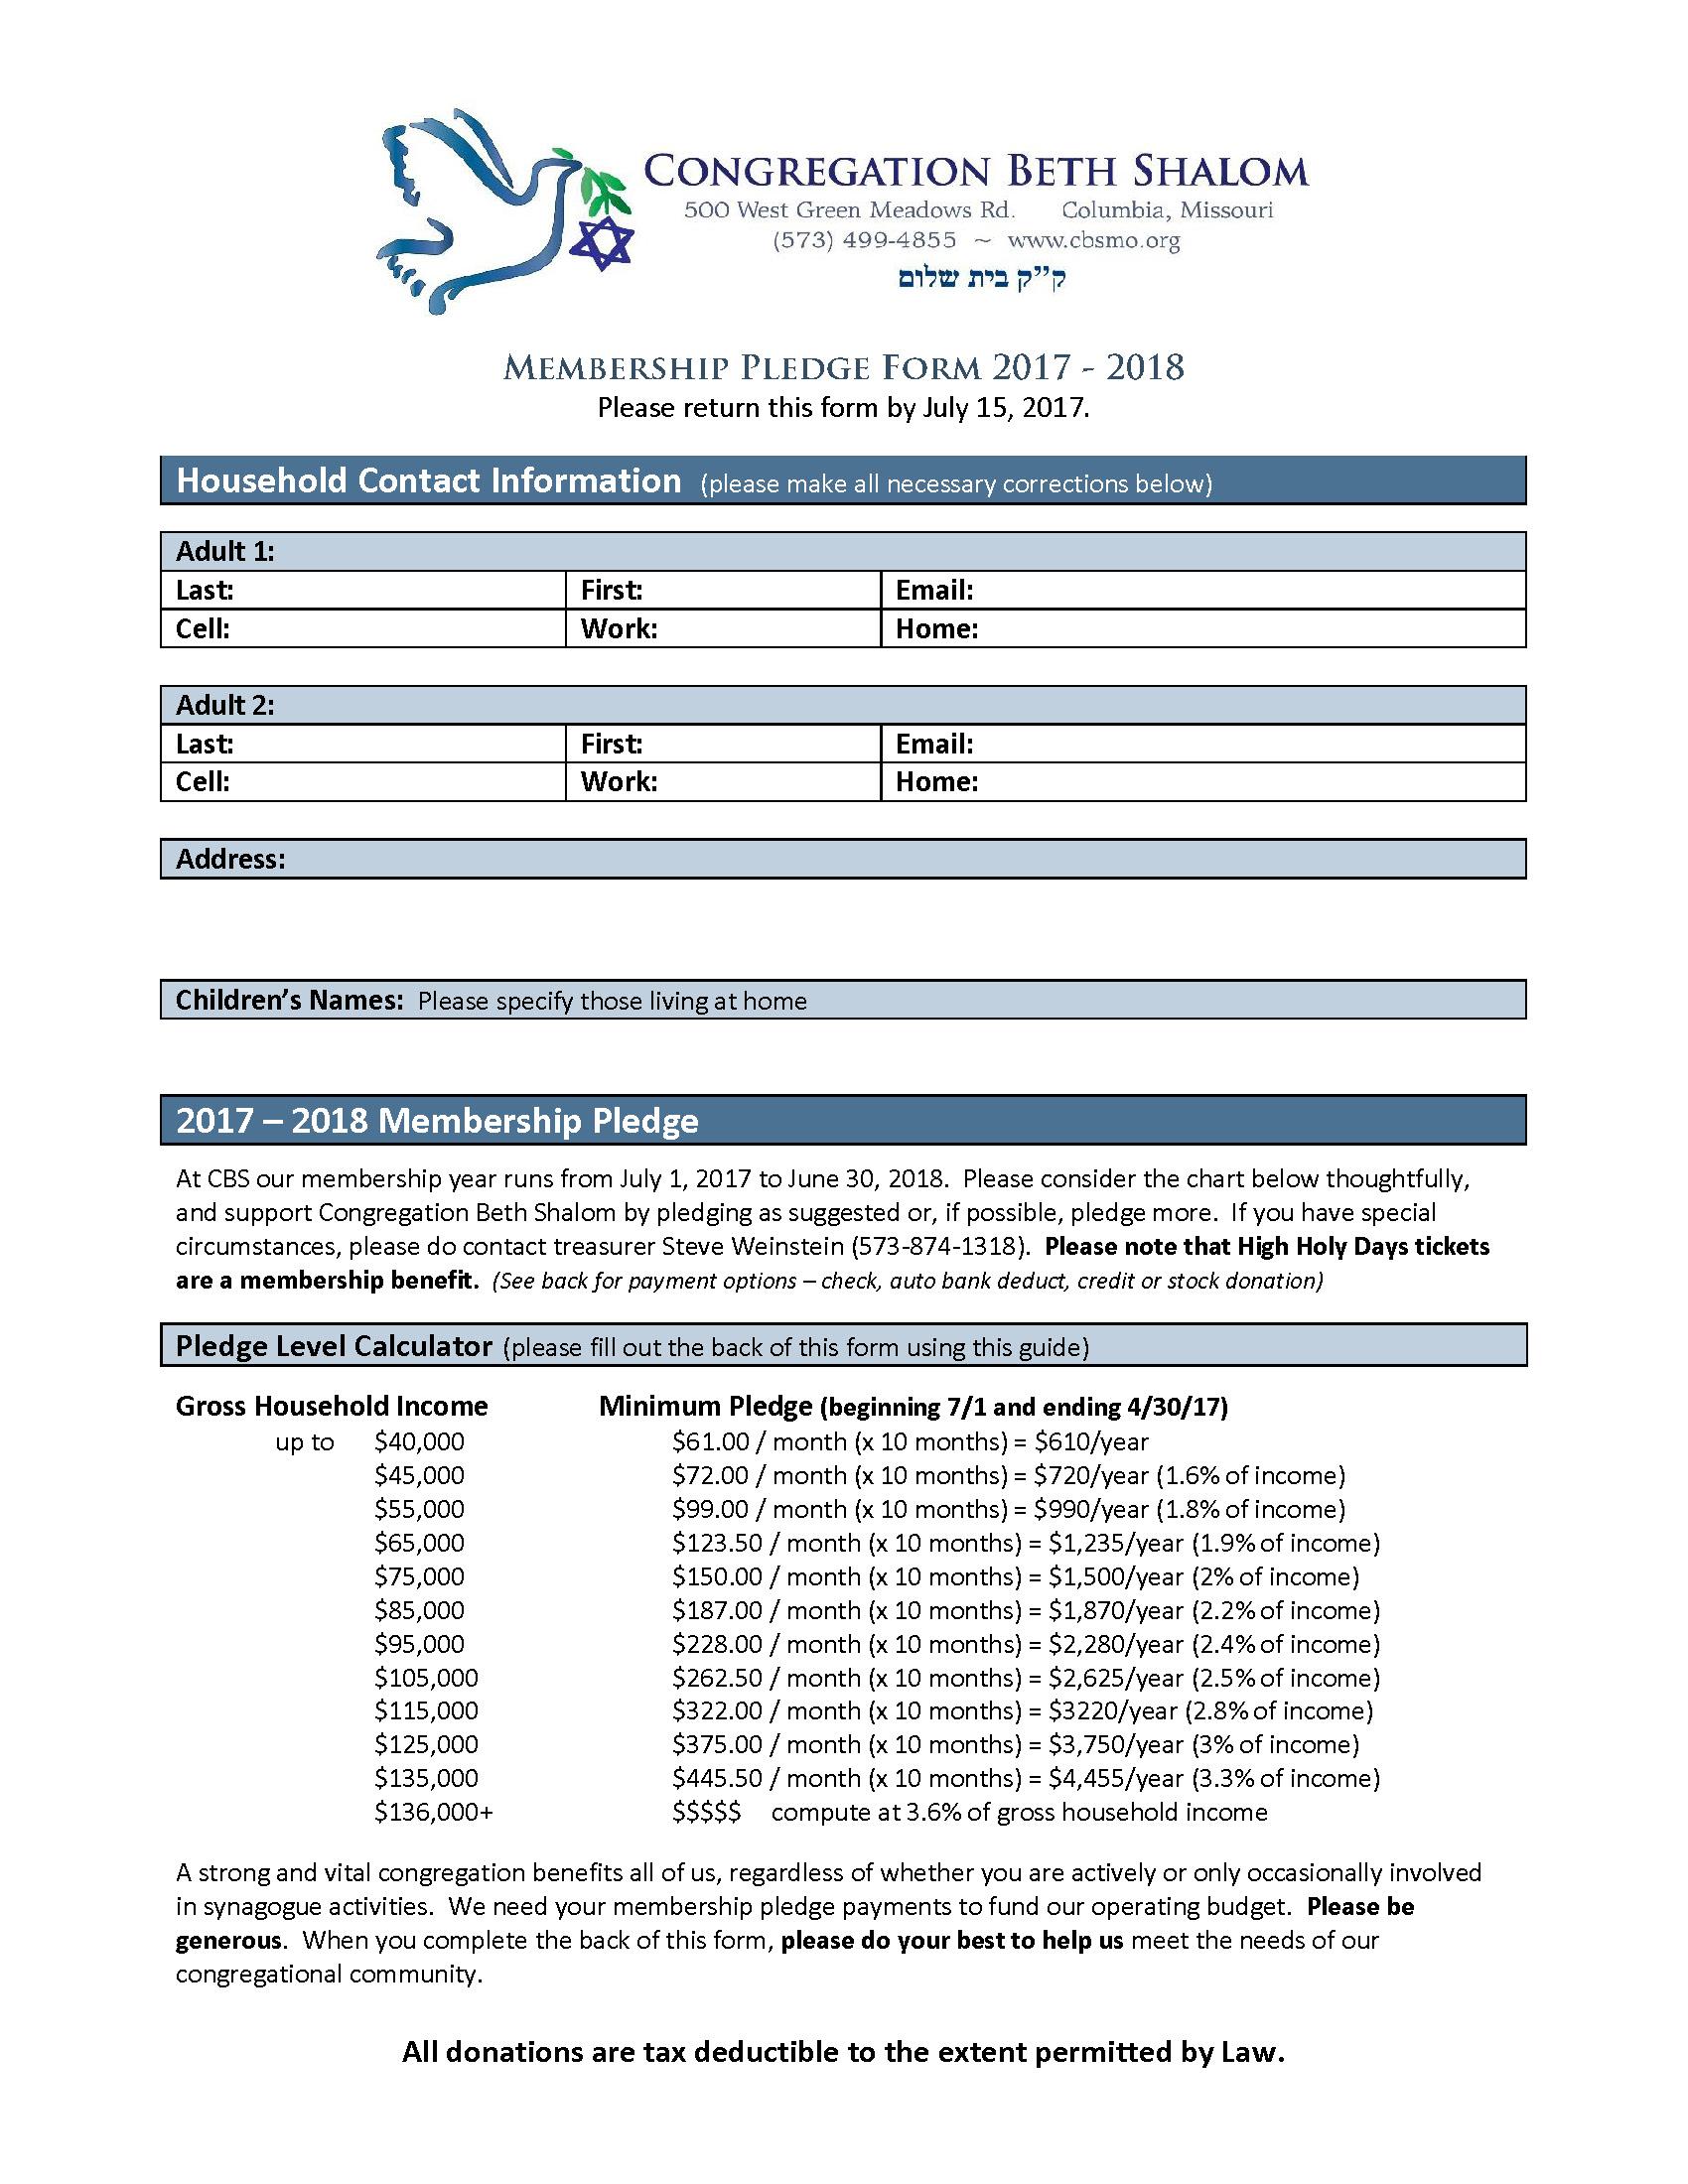 2017 2018 Pledge Form Blank Page 1